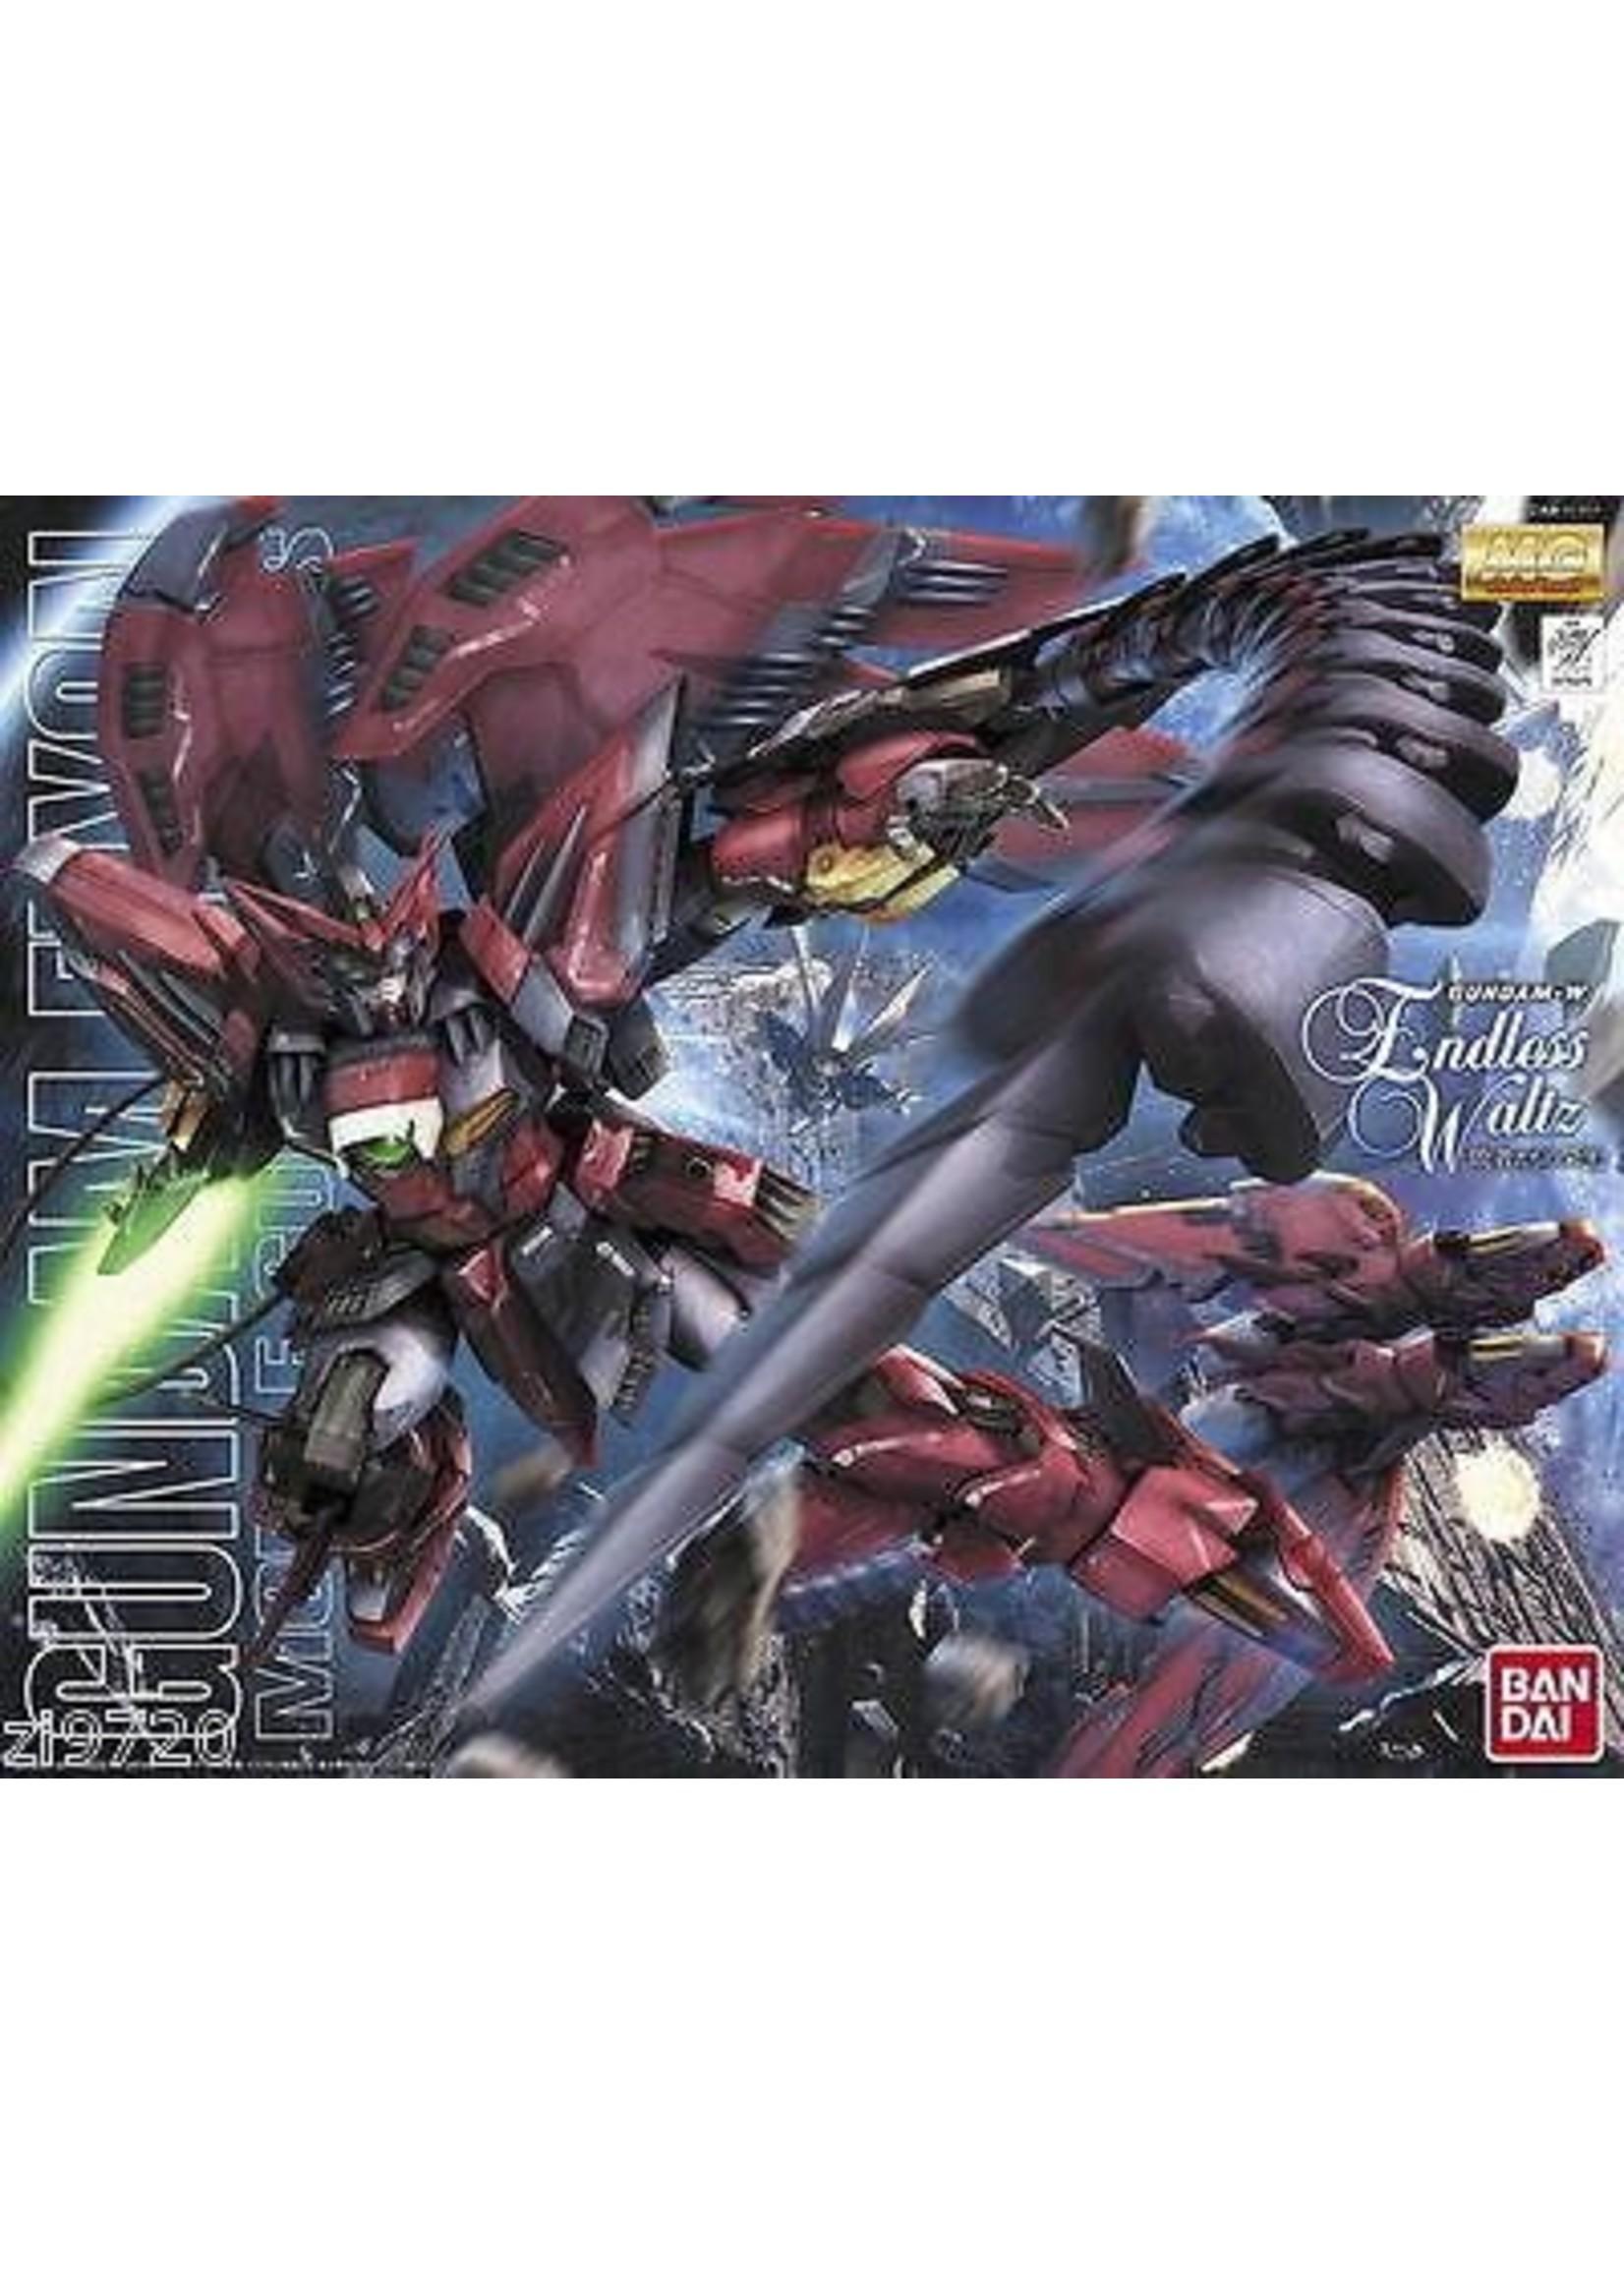 Gundam: 1/100 Gundam Epyon EW Ver. MG